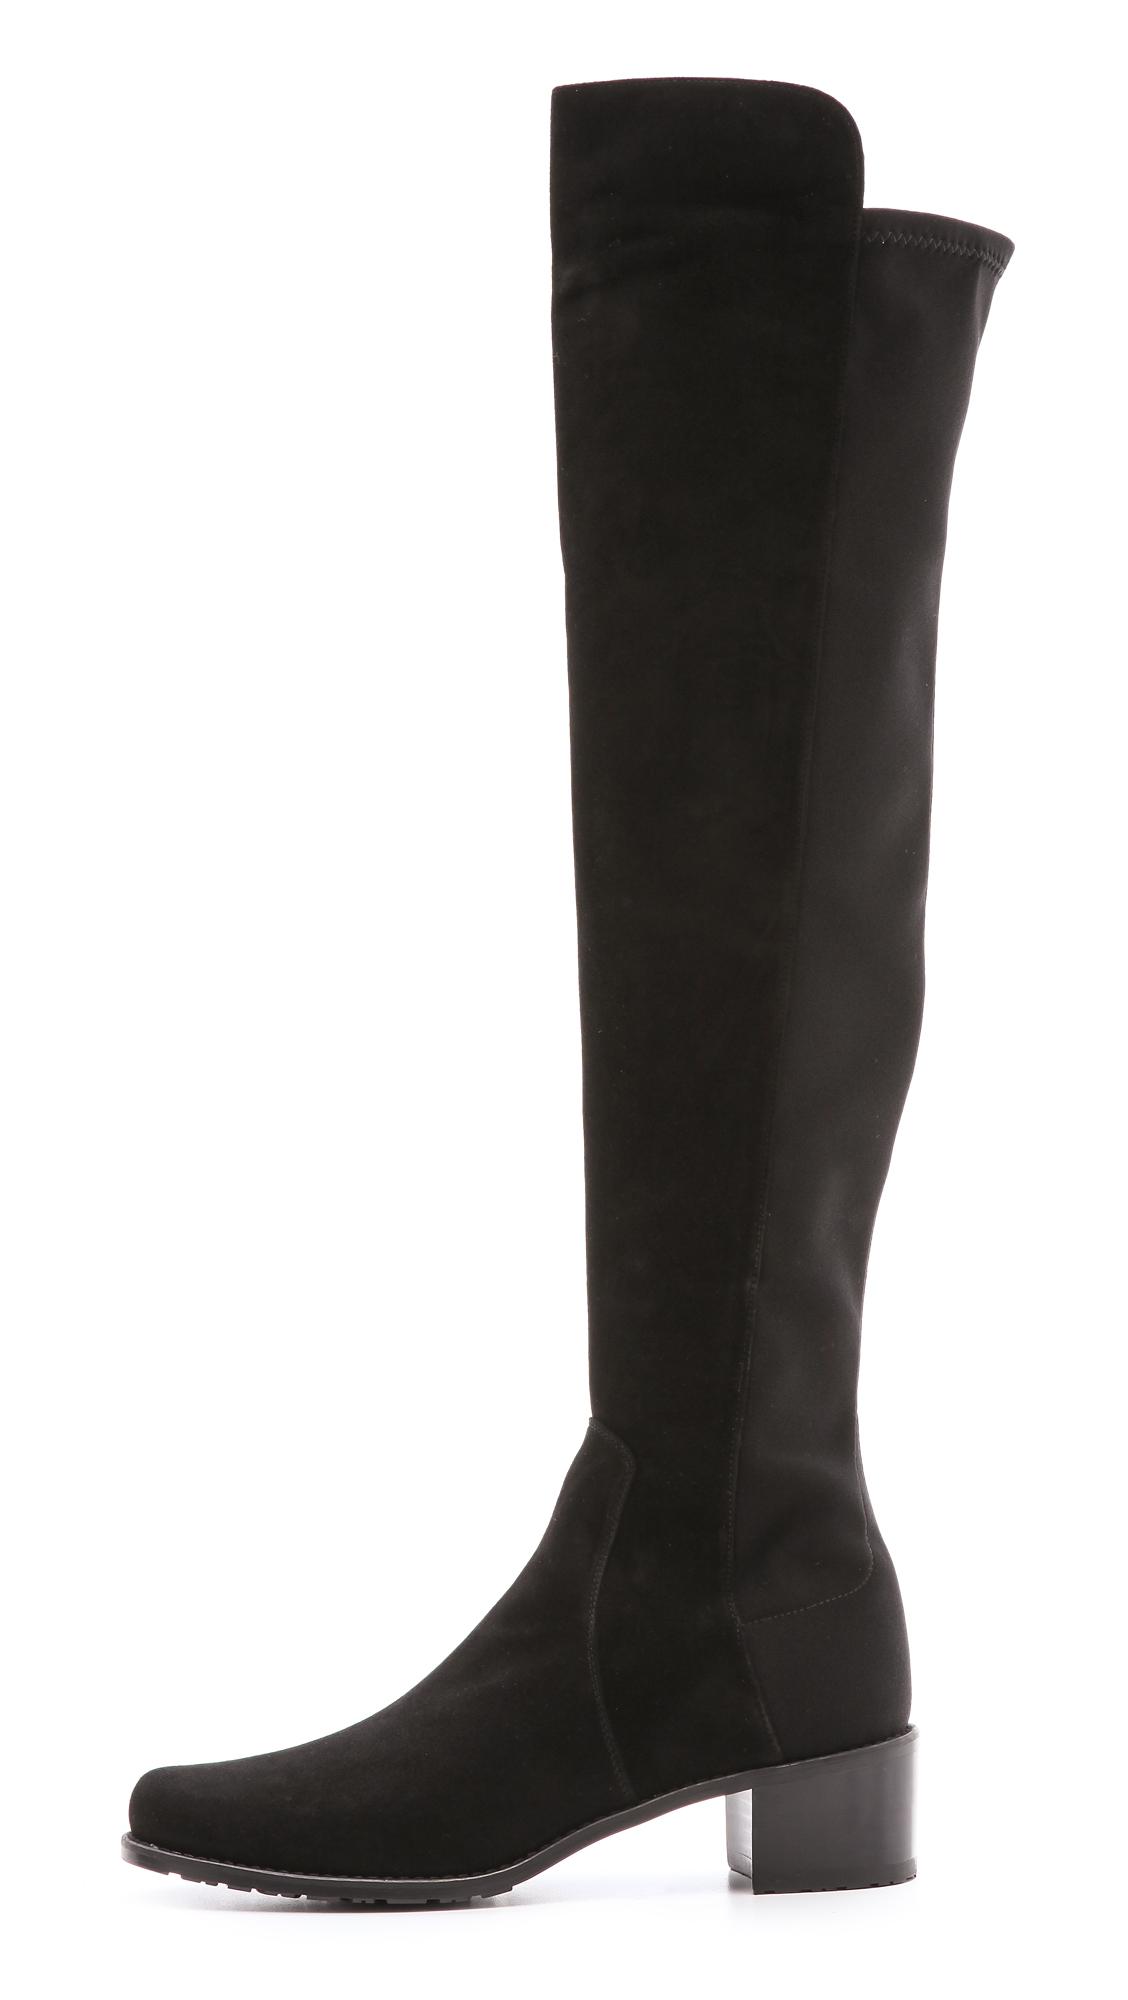 stuart weitzman reserve stretch suede boots in black lyst